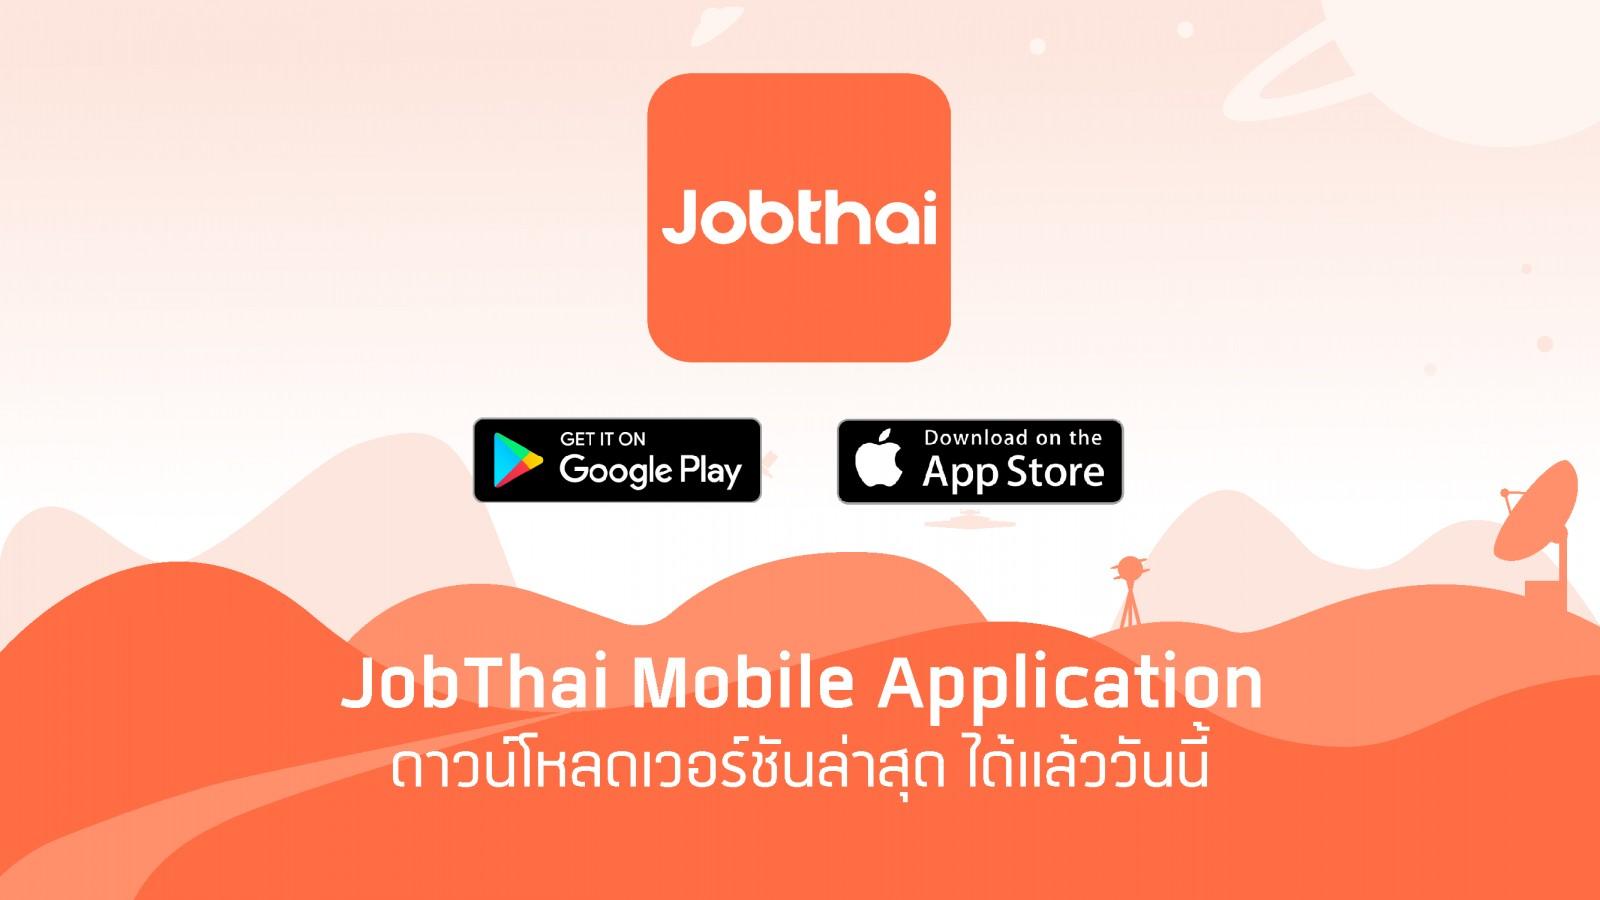 JobThai Mobile Application งาน หางาน สมัครงาน ดาวน์โหลด Application